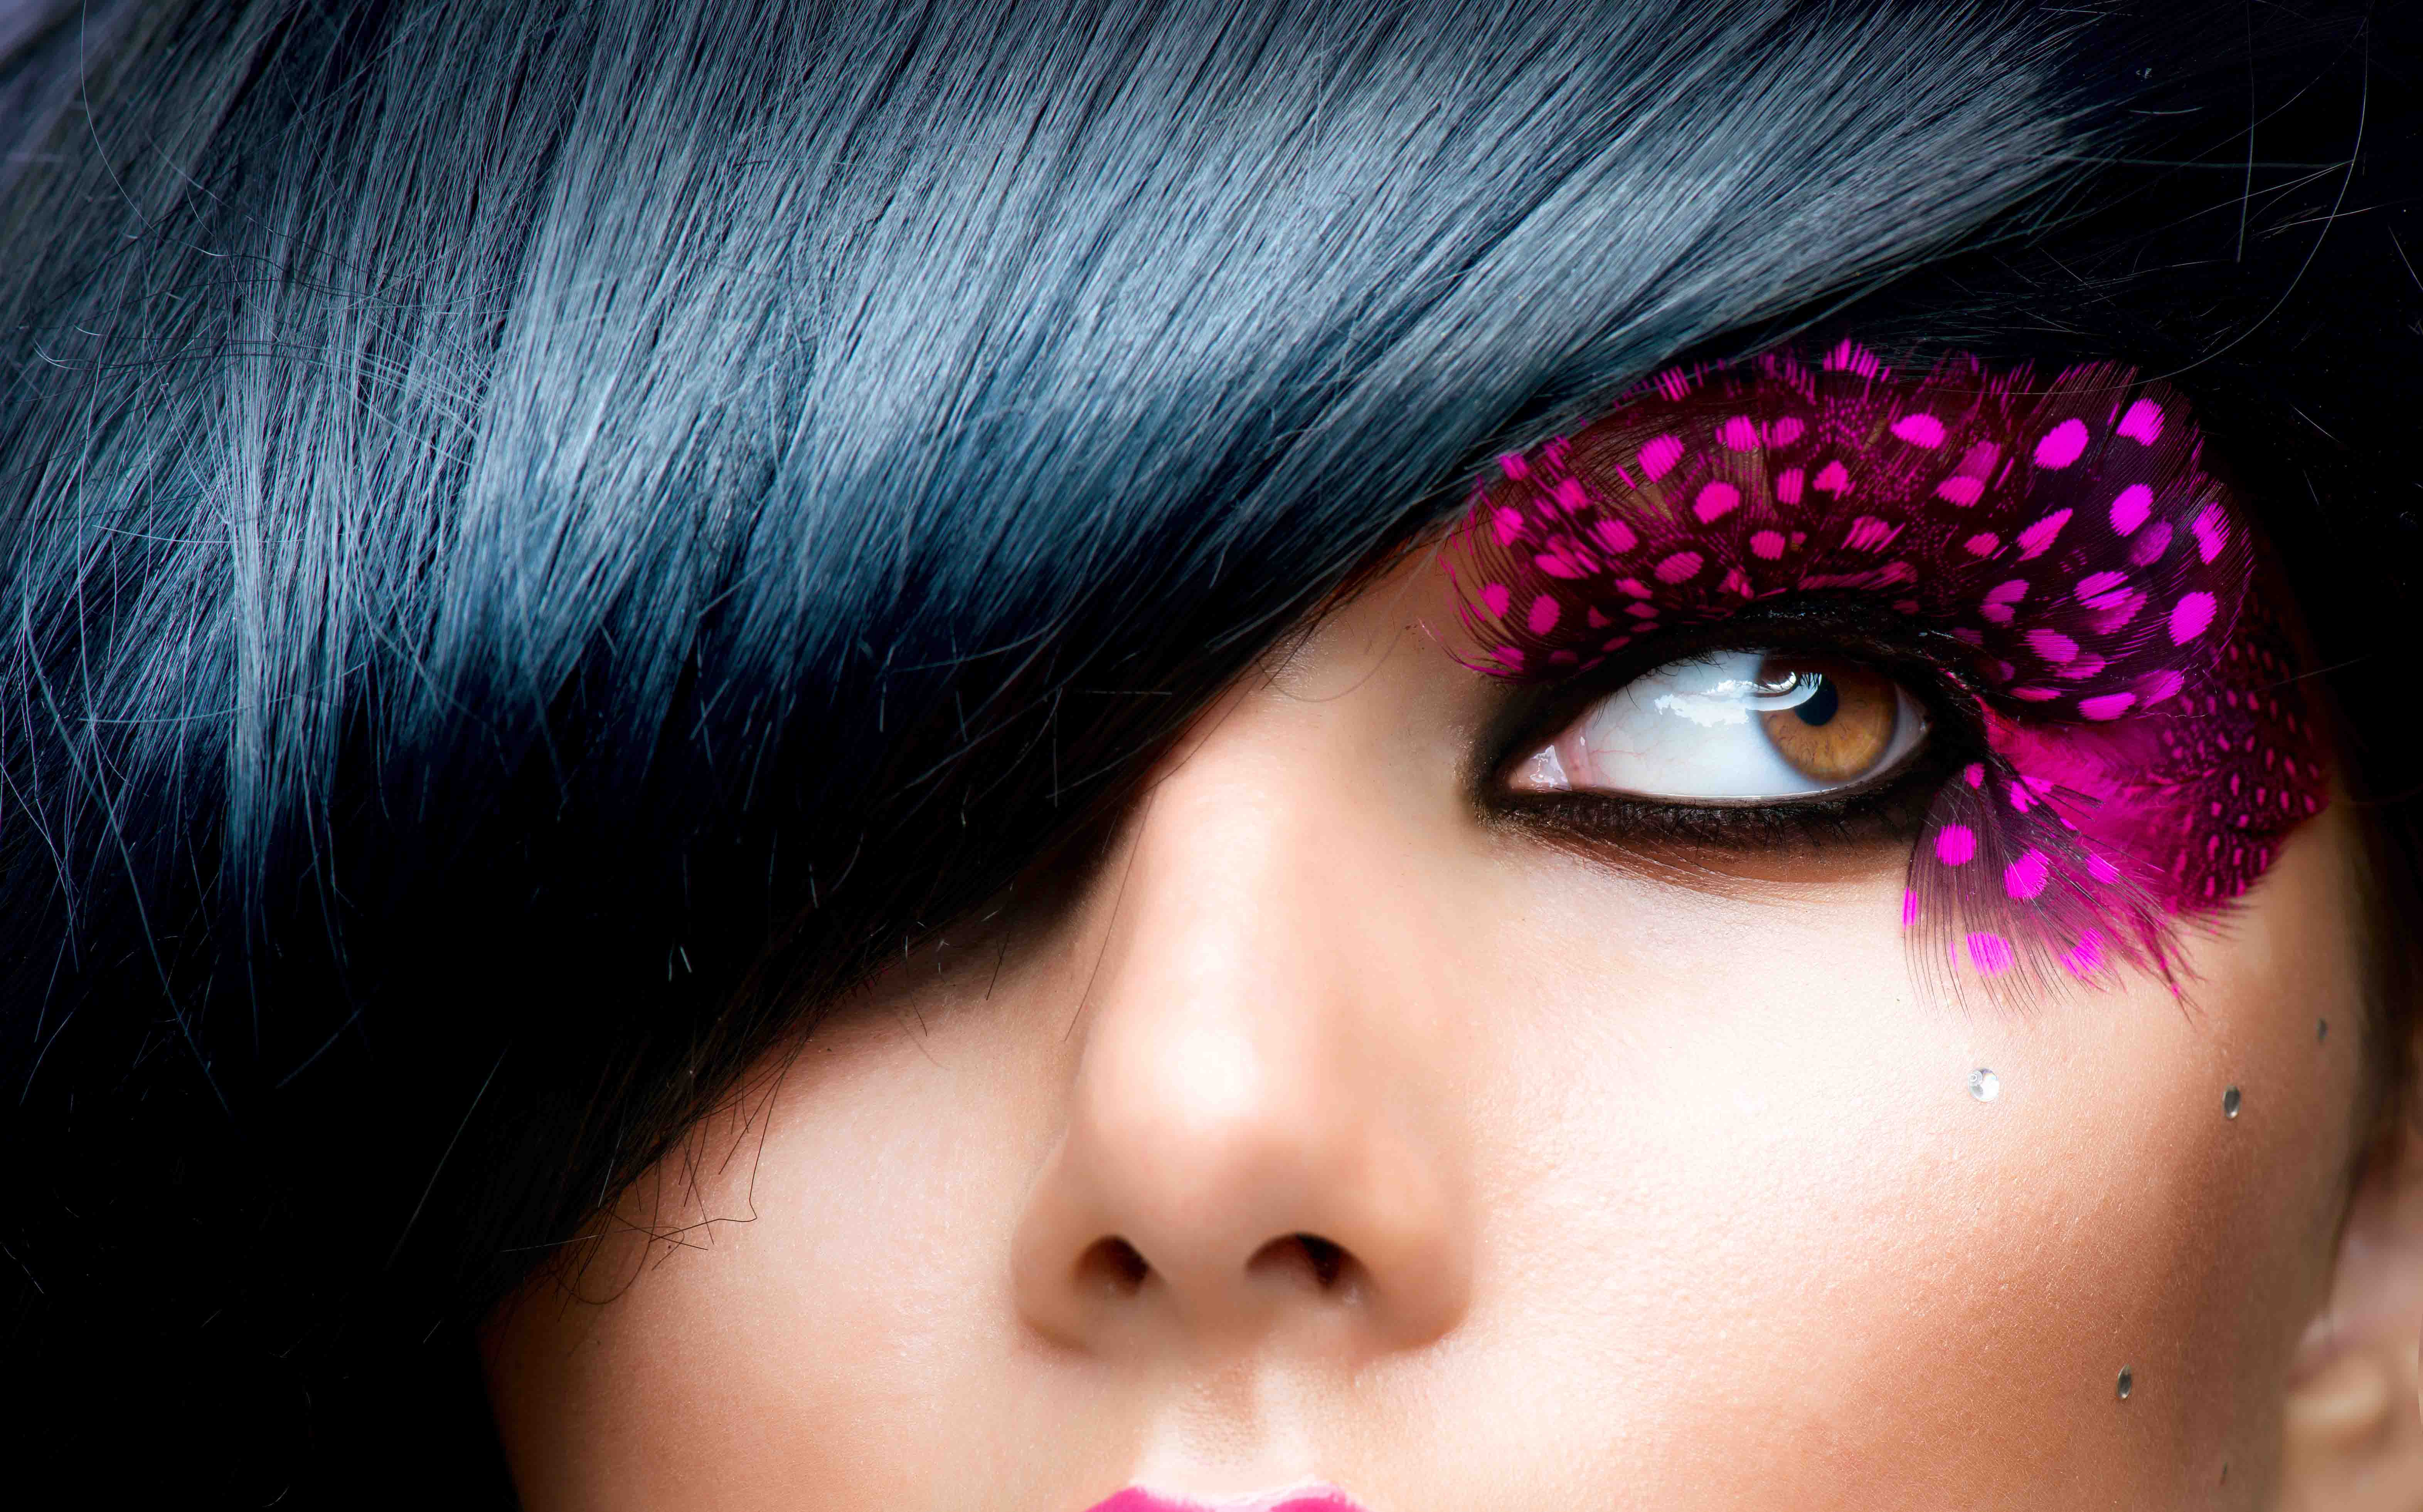 capelli-neri-zephir-parrucchieri-ascona-muralto.jpg